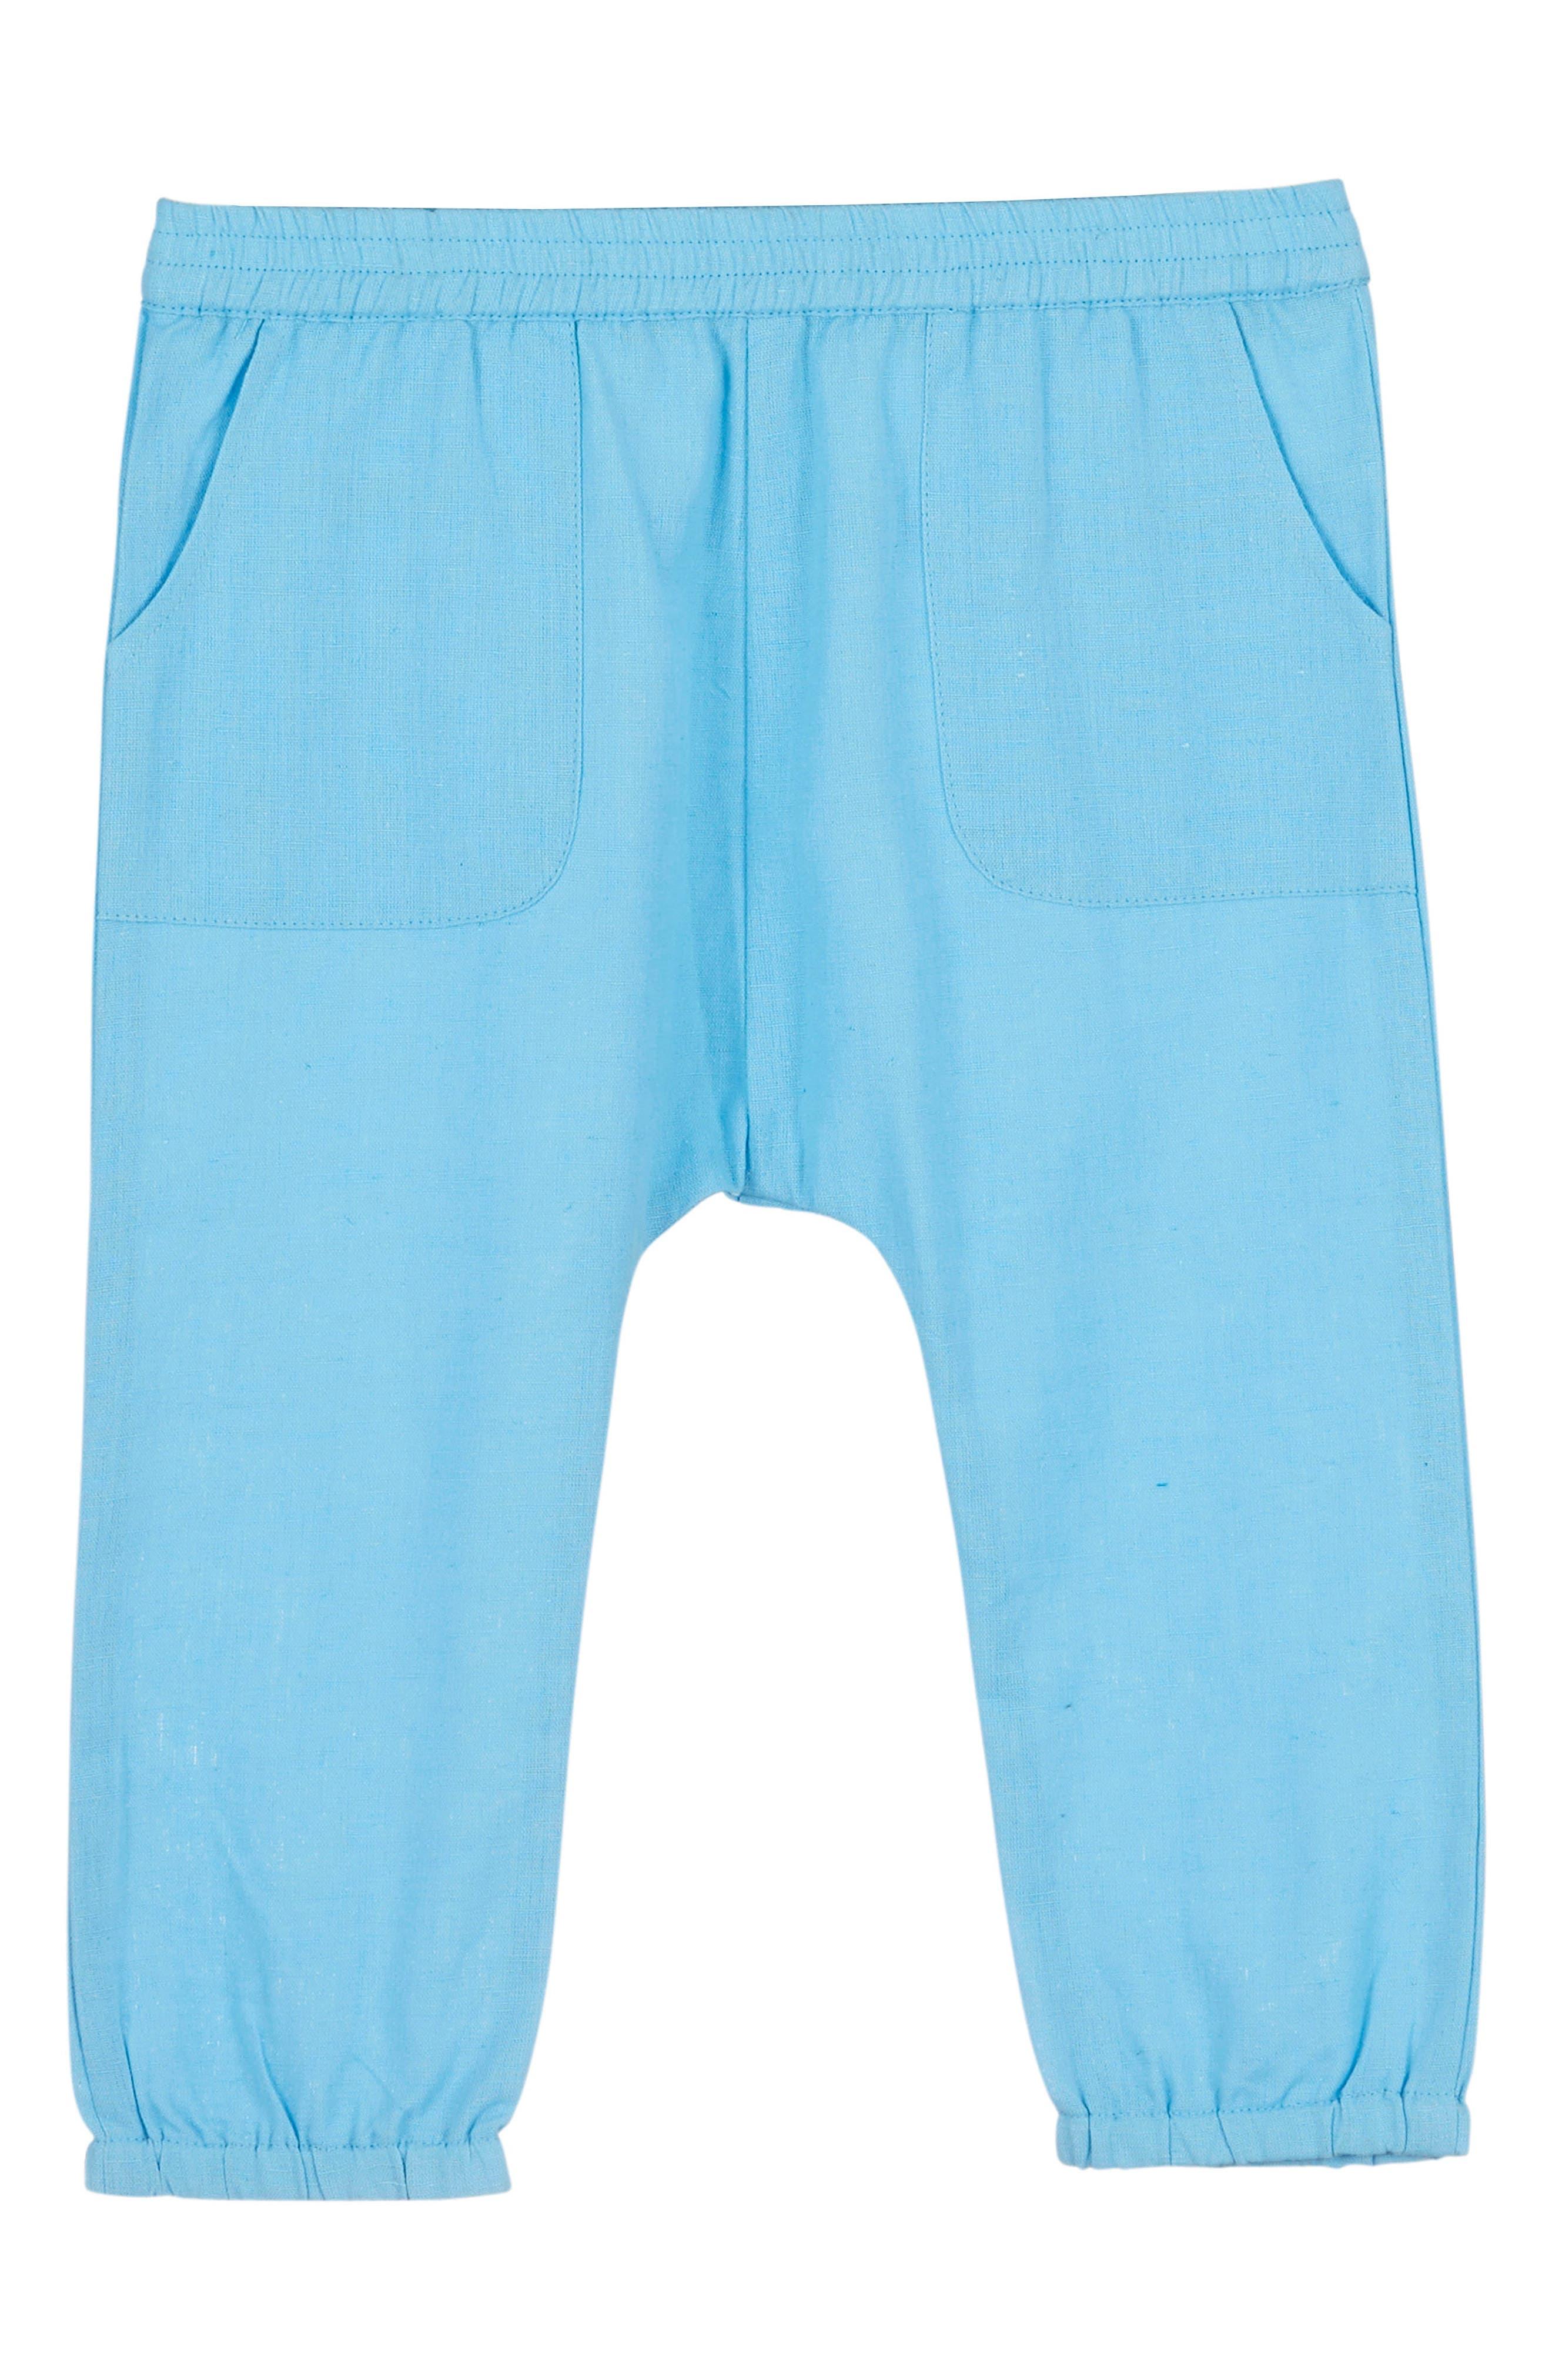 Alternate Image 1 Selected - Margherita Harem Pants (Toddler Girls & Little Girls)